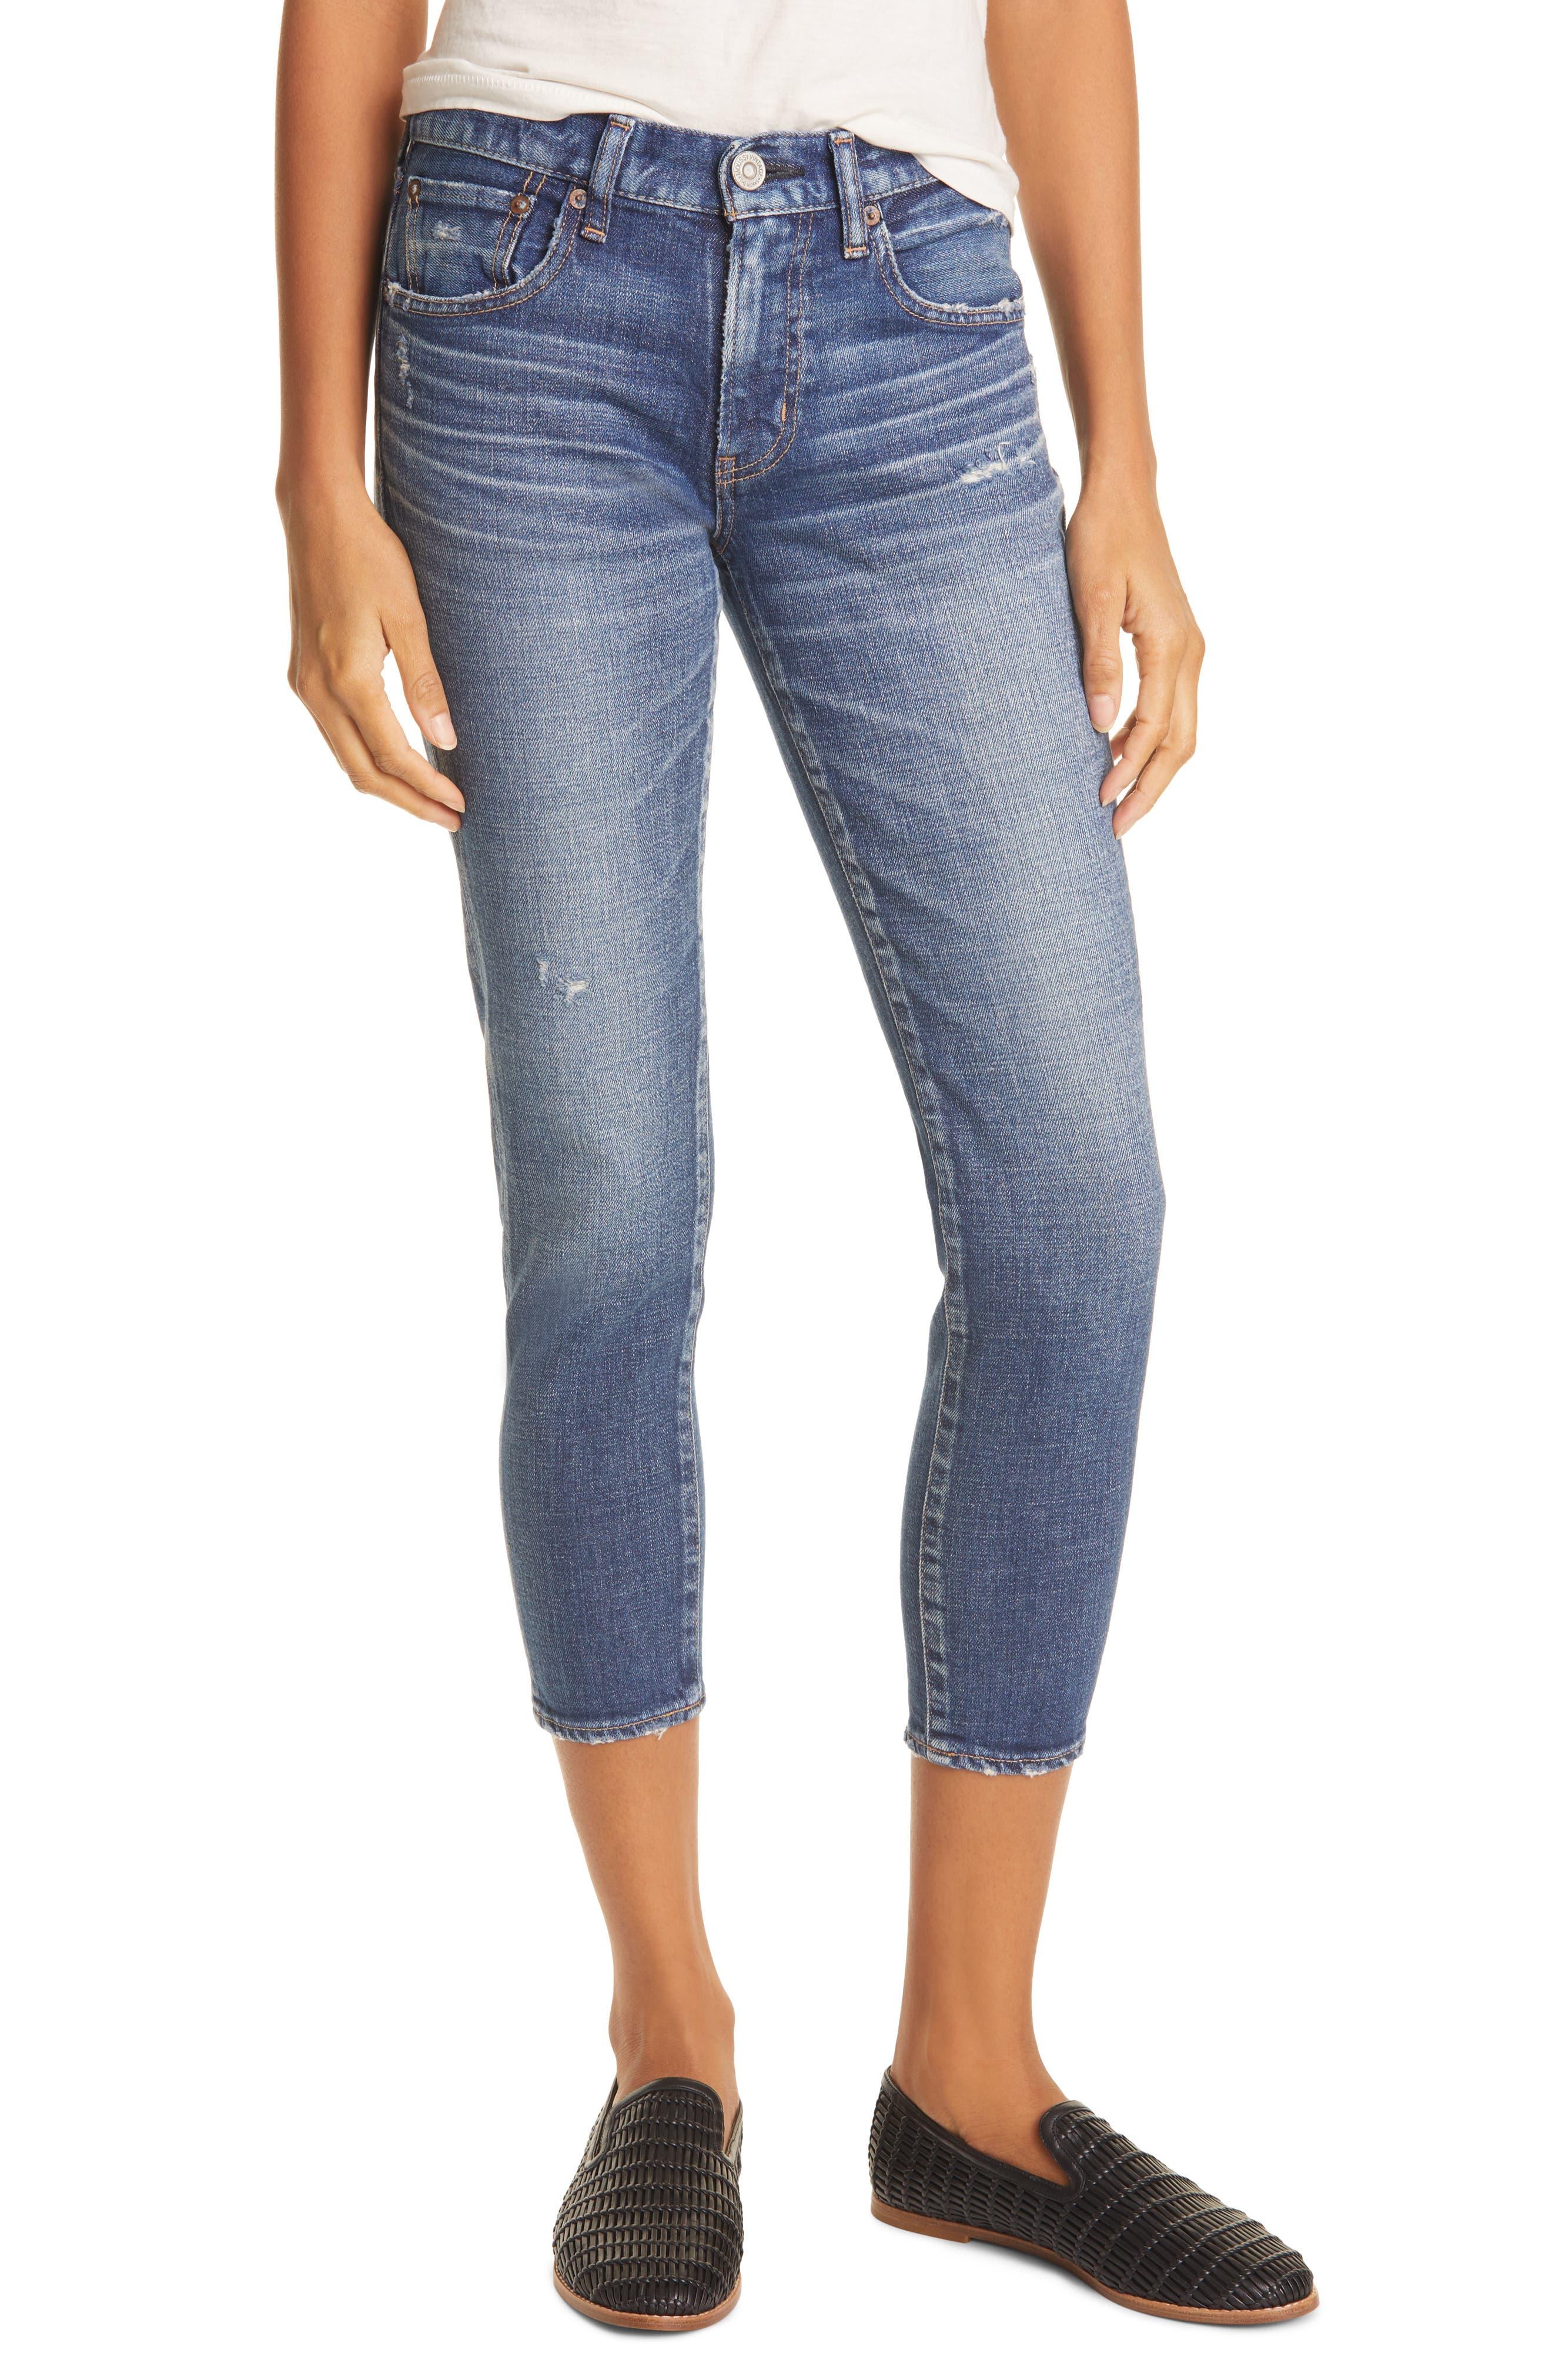 Prichard Ankle Skinny Jeans